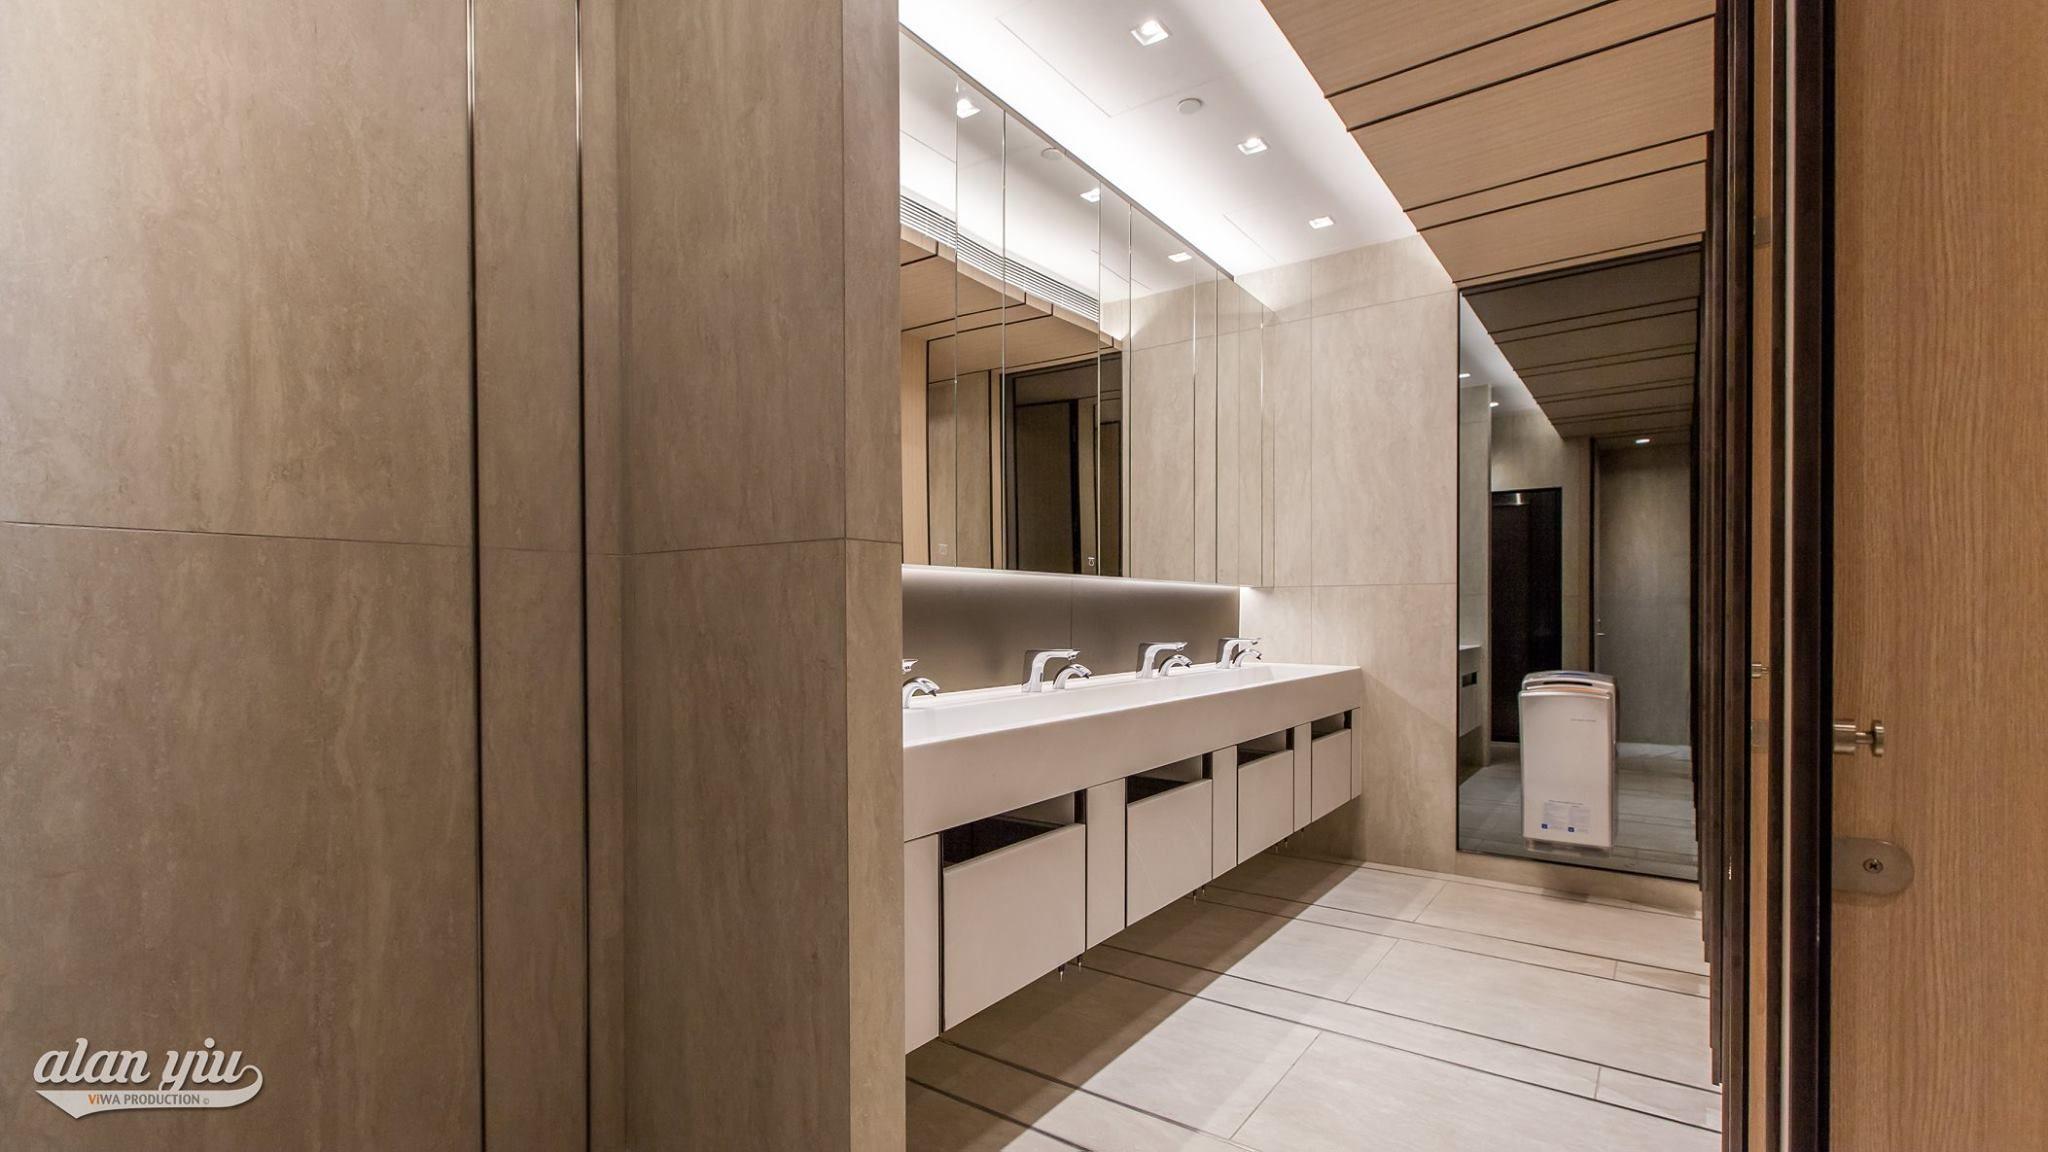 Viwa Production 希爾頓中心衛生間 Hilton Plaza Washroom Interior Design Project Shooting Interior Design Projects Interior Design Design Projects